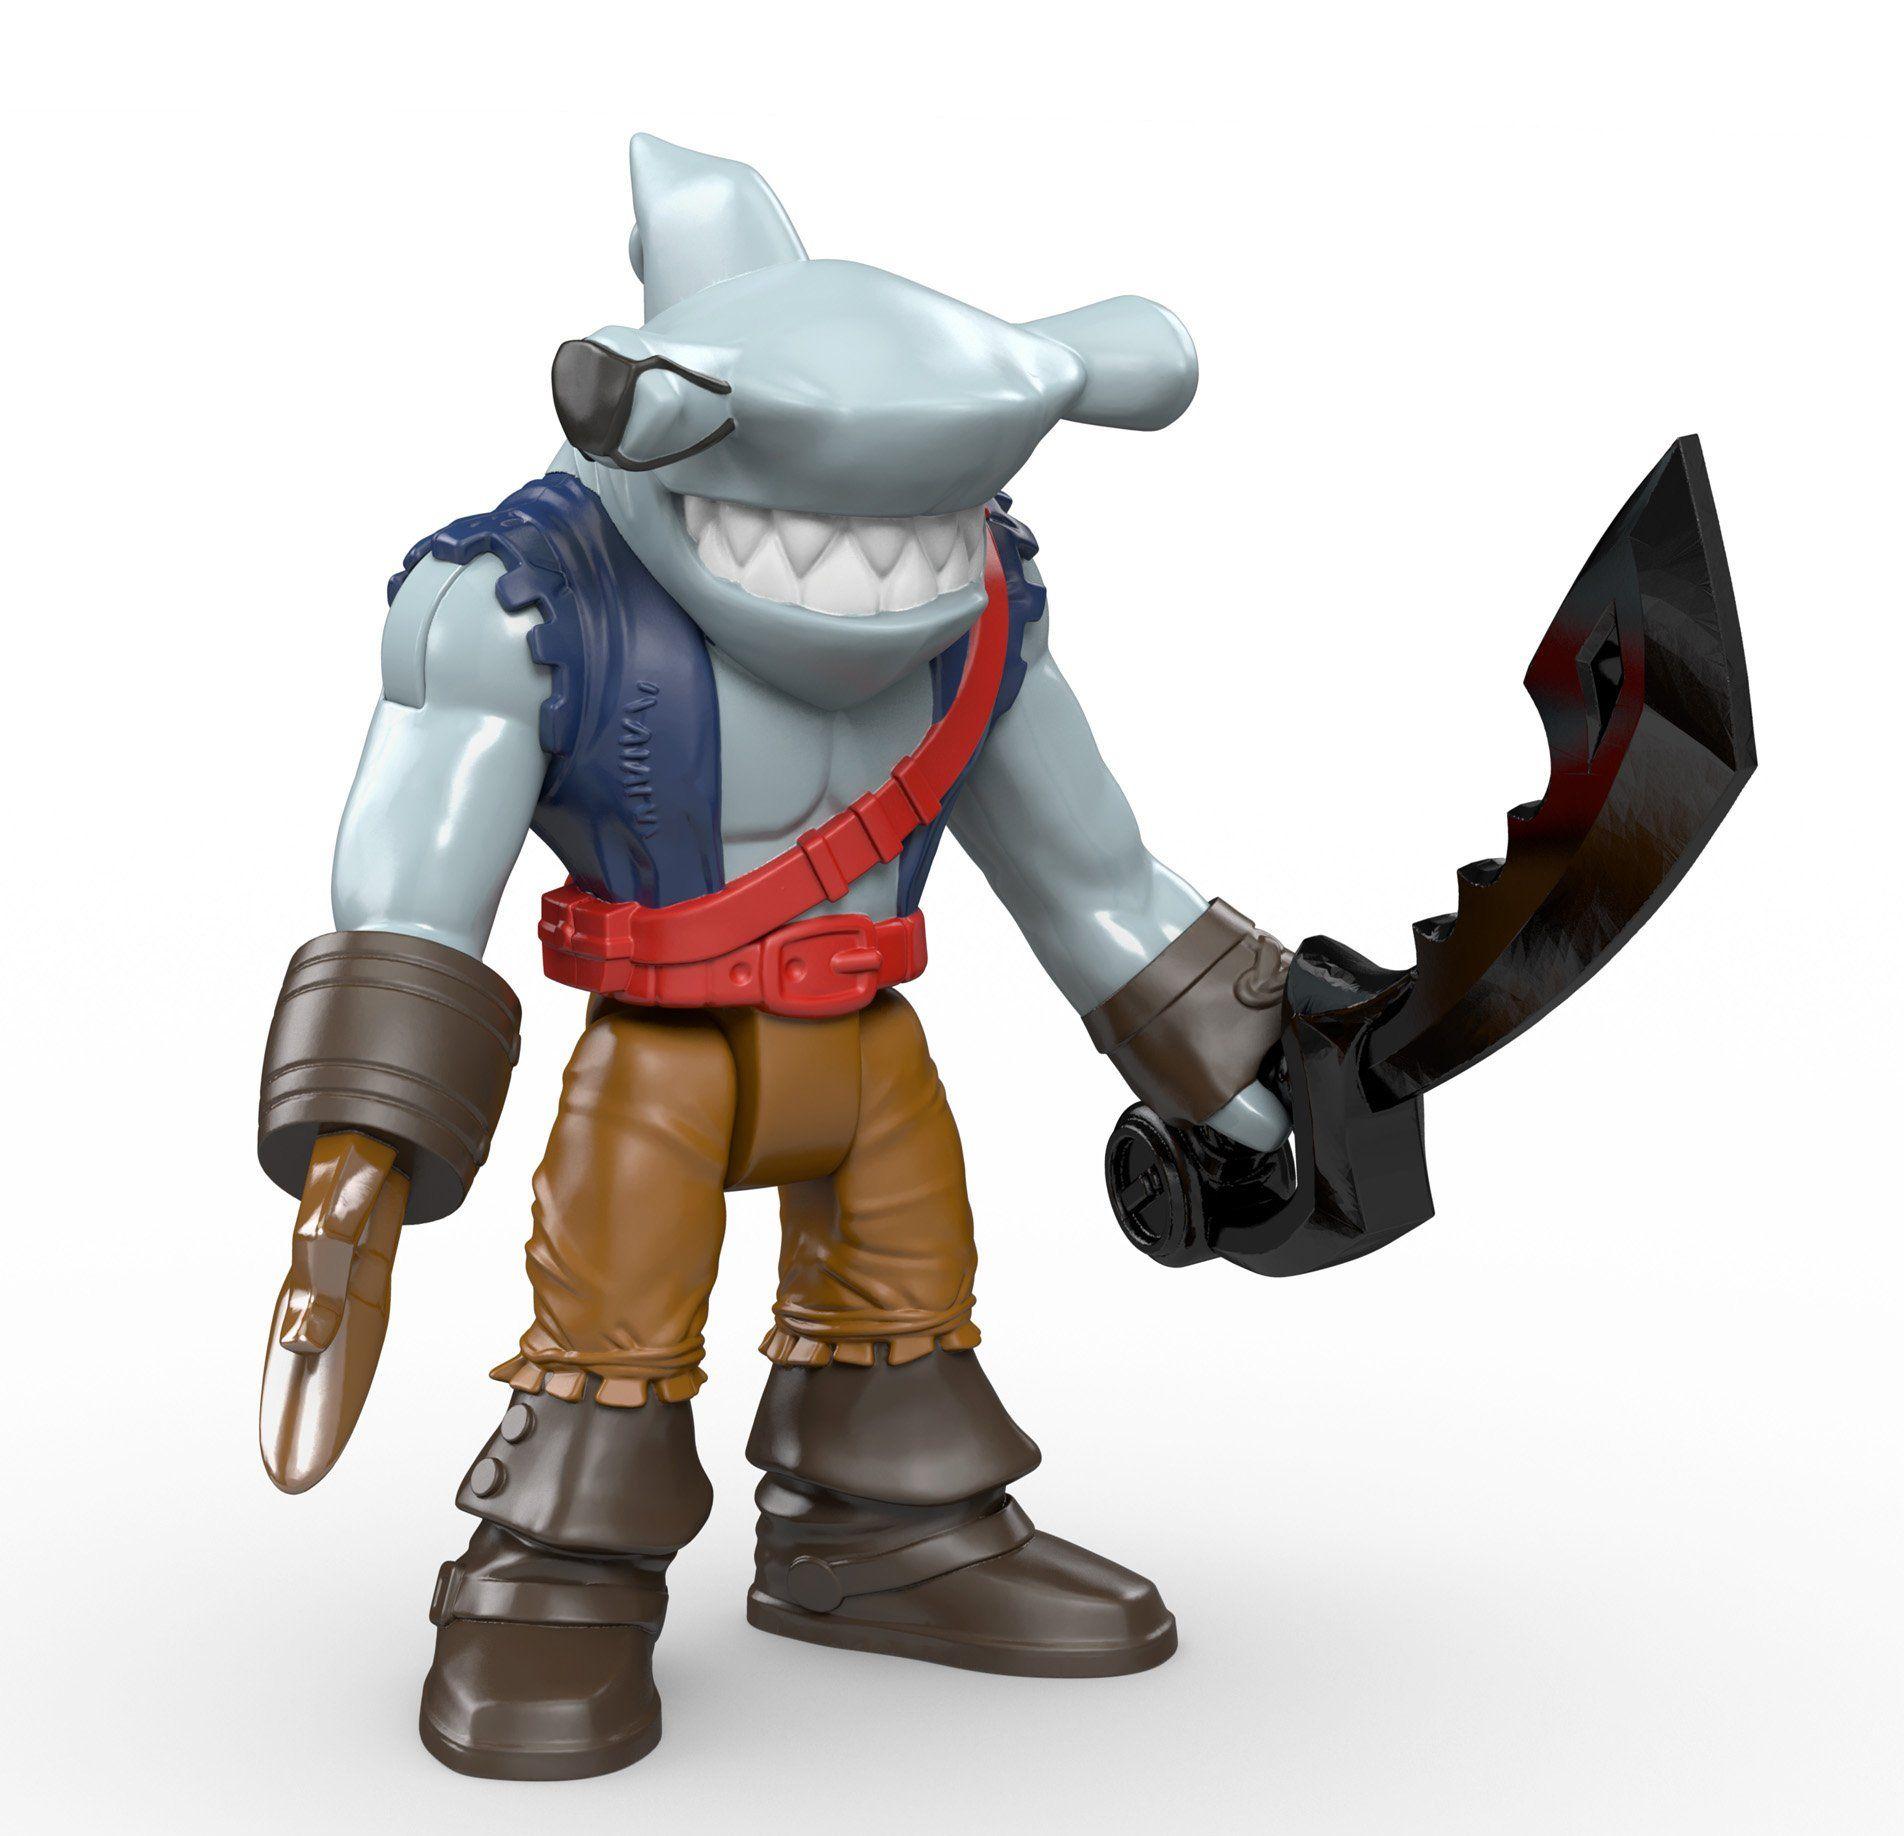 FisherPrice Imaginext Mega Mouth Shark >>> You can find